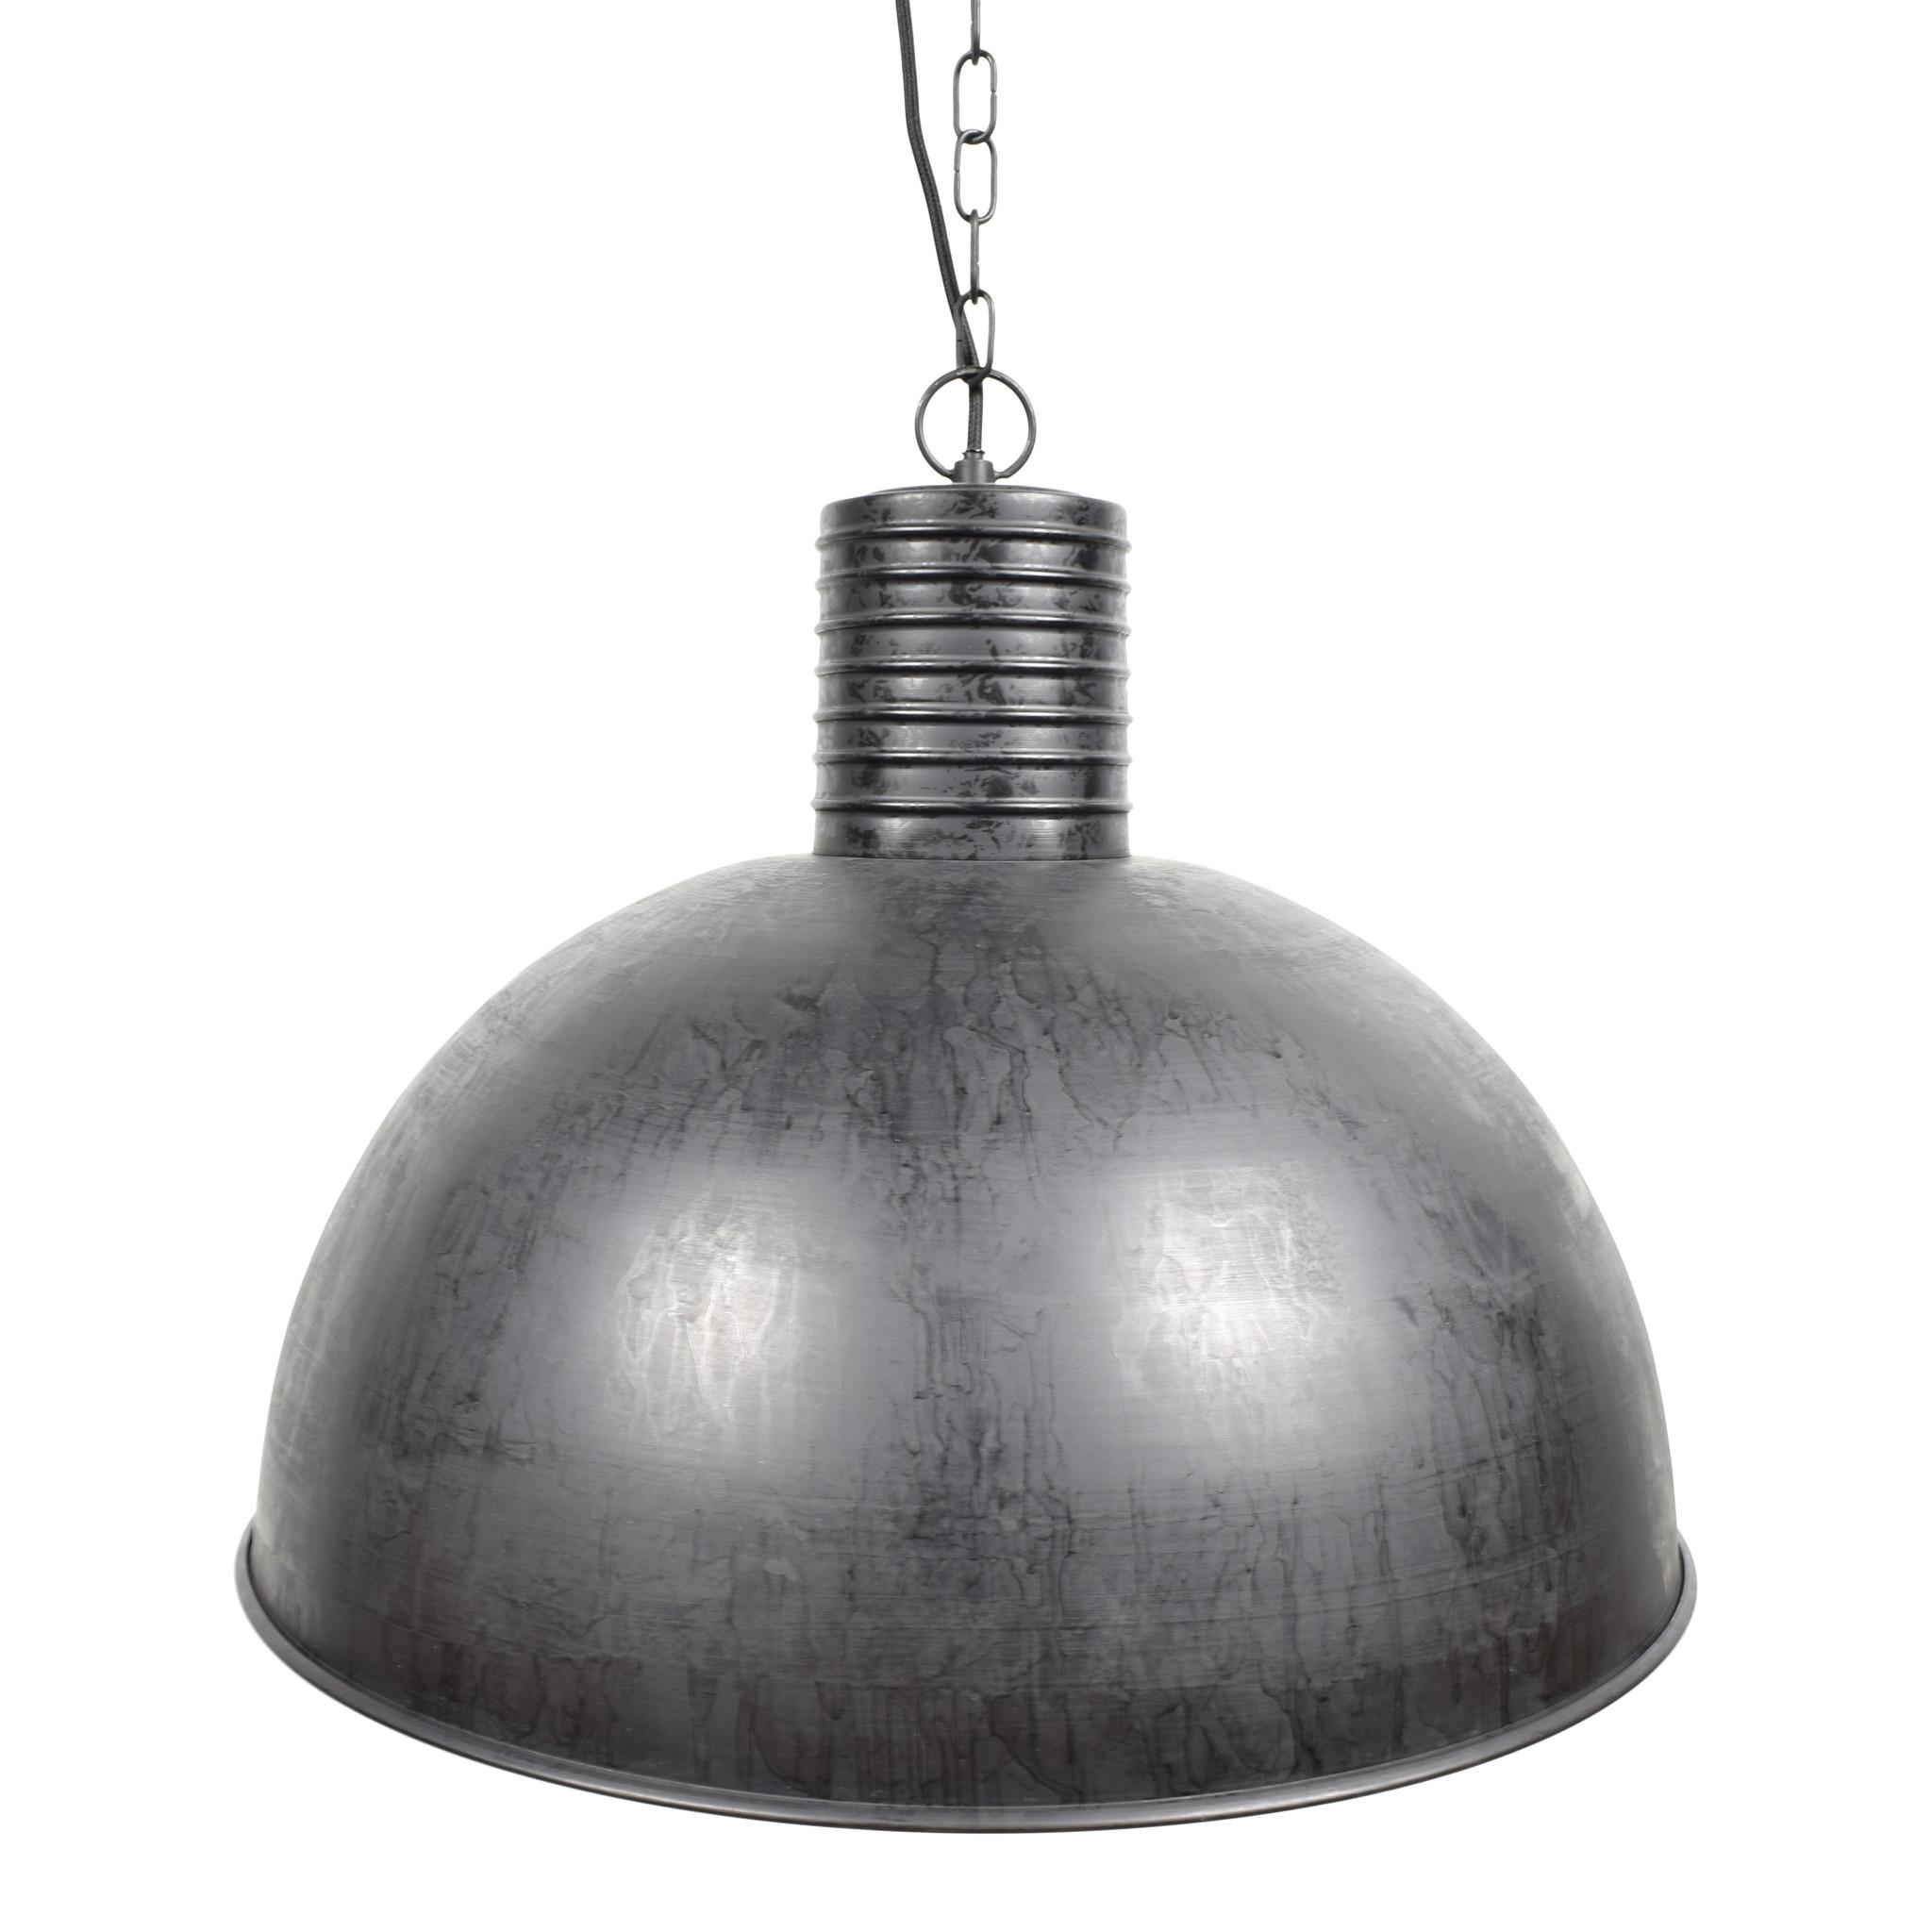 Urban Interiors Urban Interiors Hanglamp Dome XL ø50cm. rough black